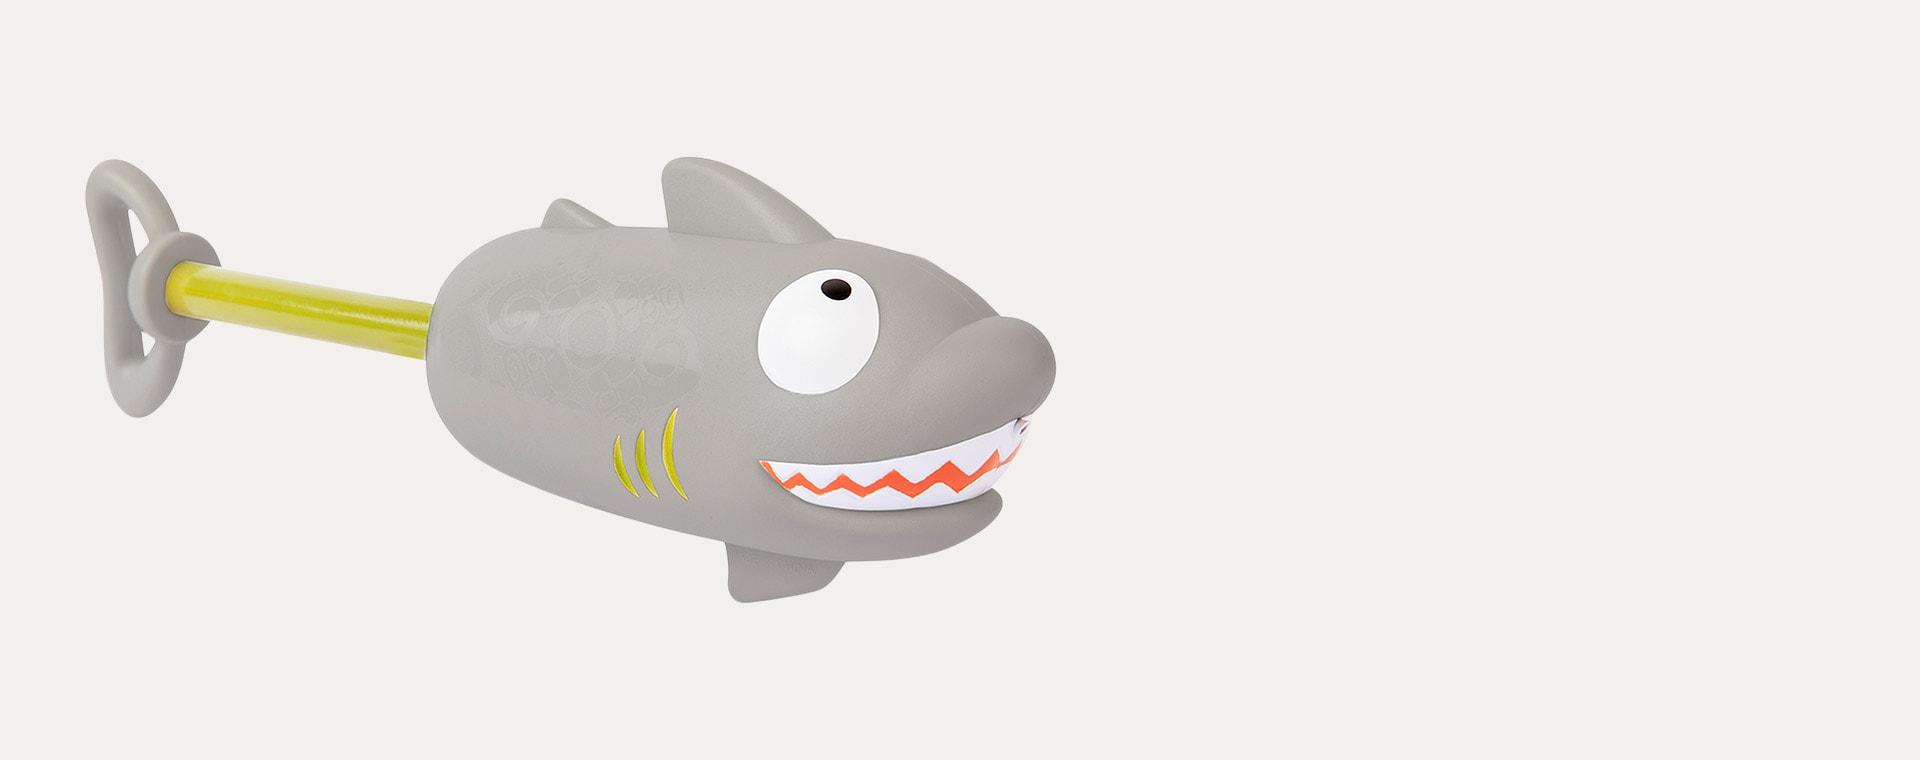 Shark Attack Sunnylife Animal Water Soaker